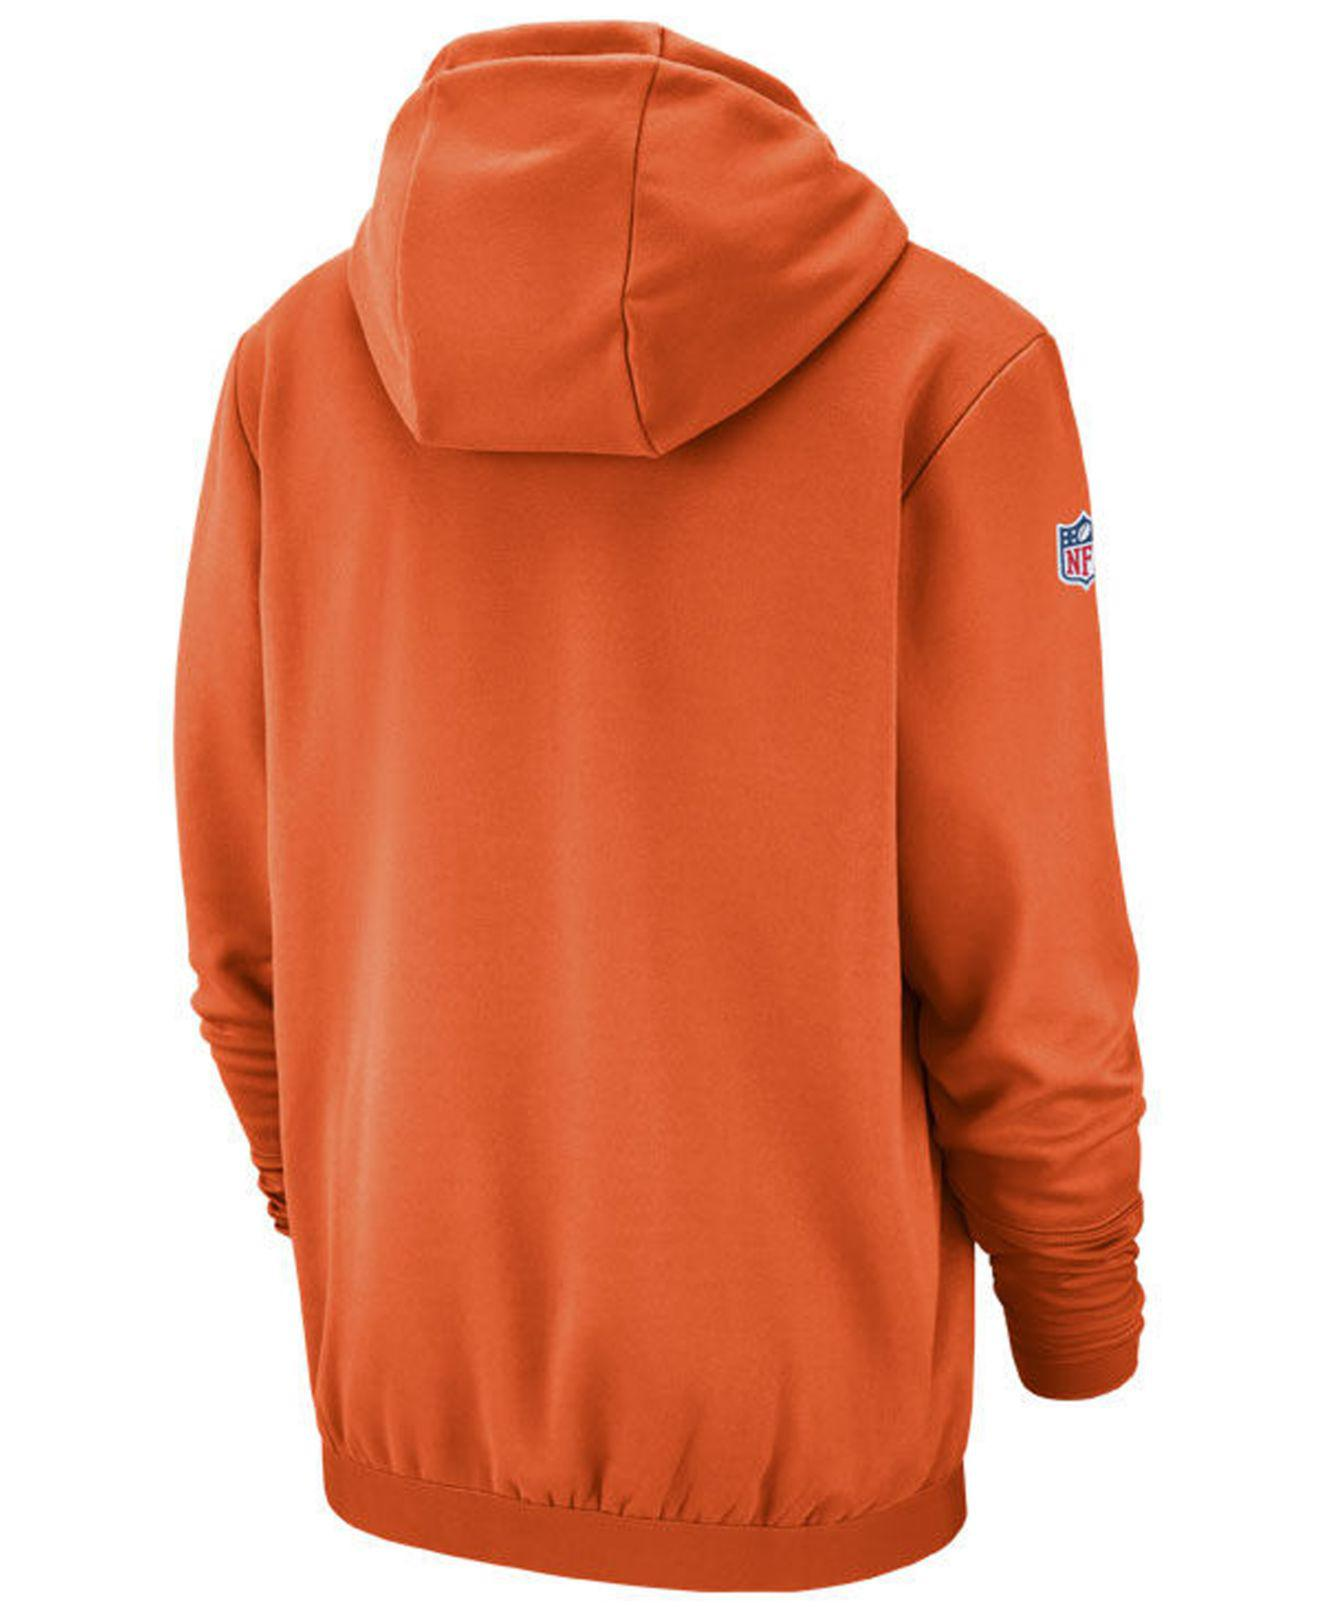 5490526ac Lyst - Nike Denver Broncos Sideline Player Local Therma Hoodie in Orange  for Men